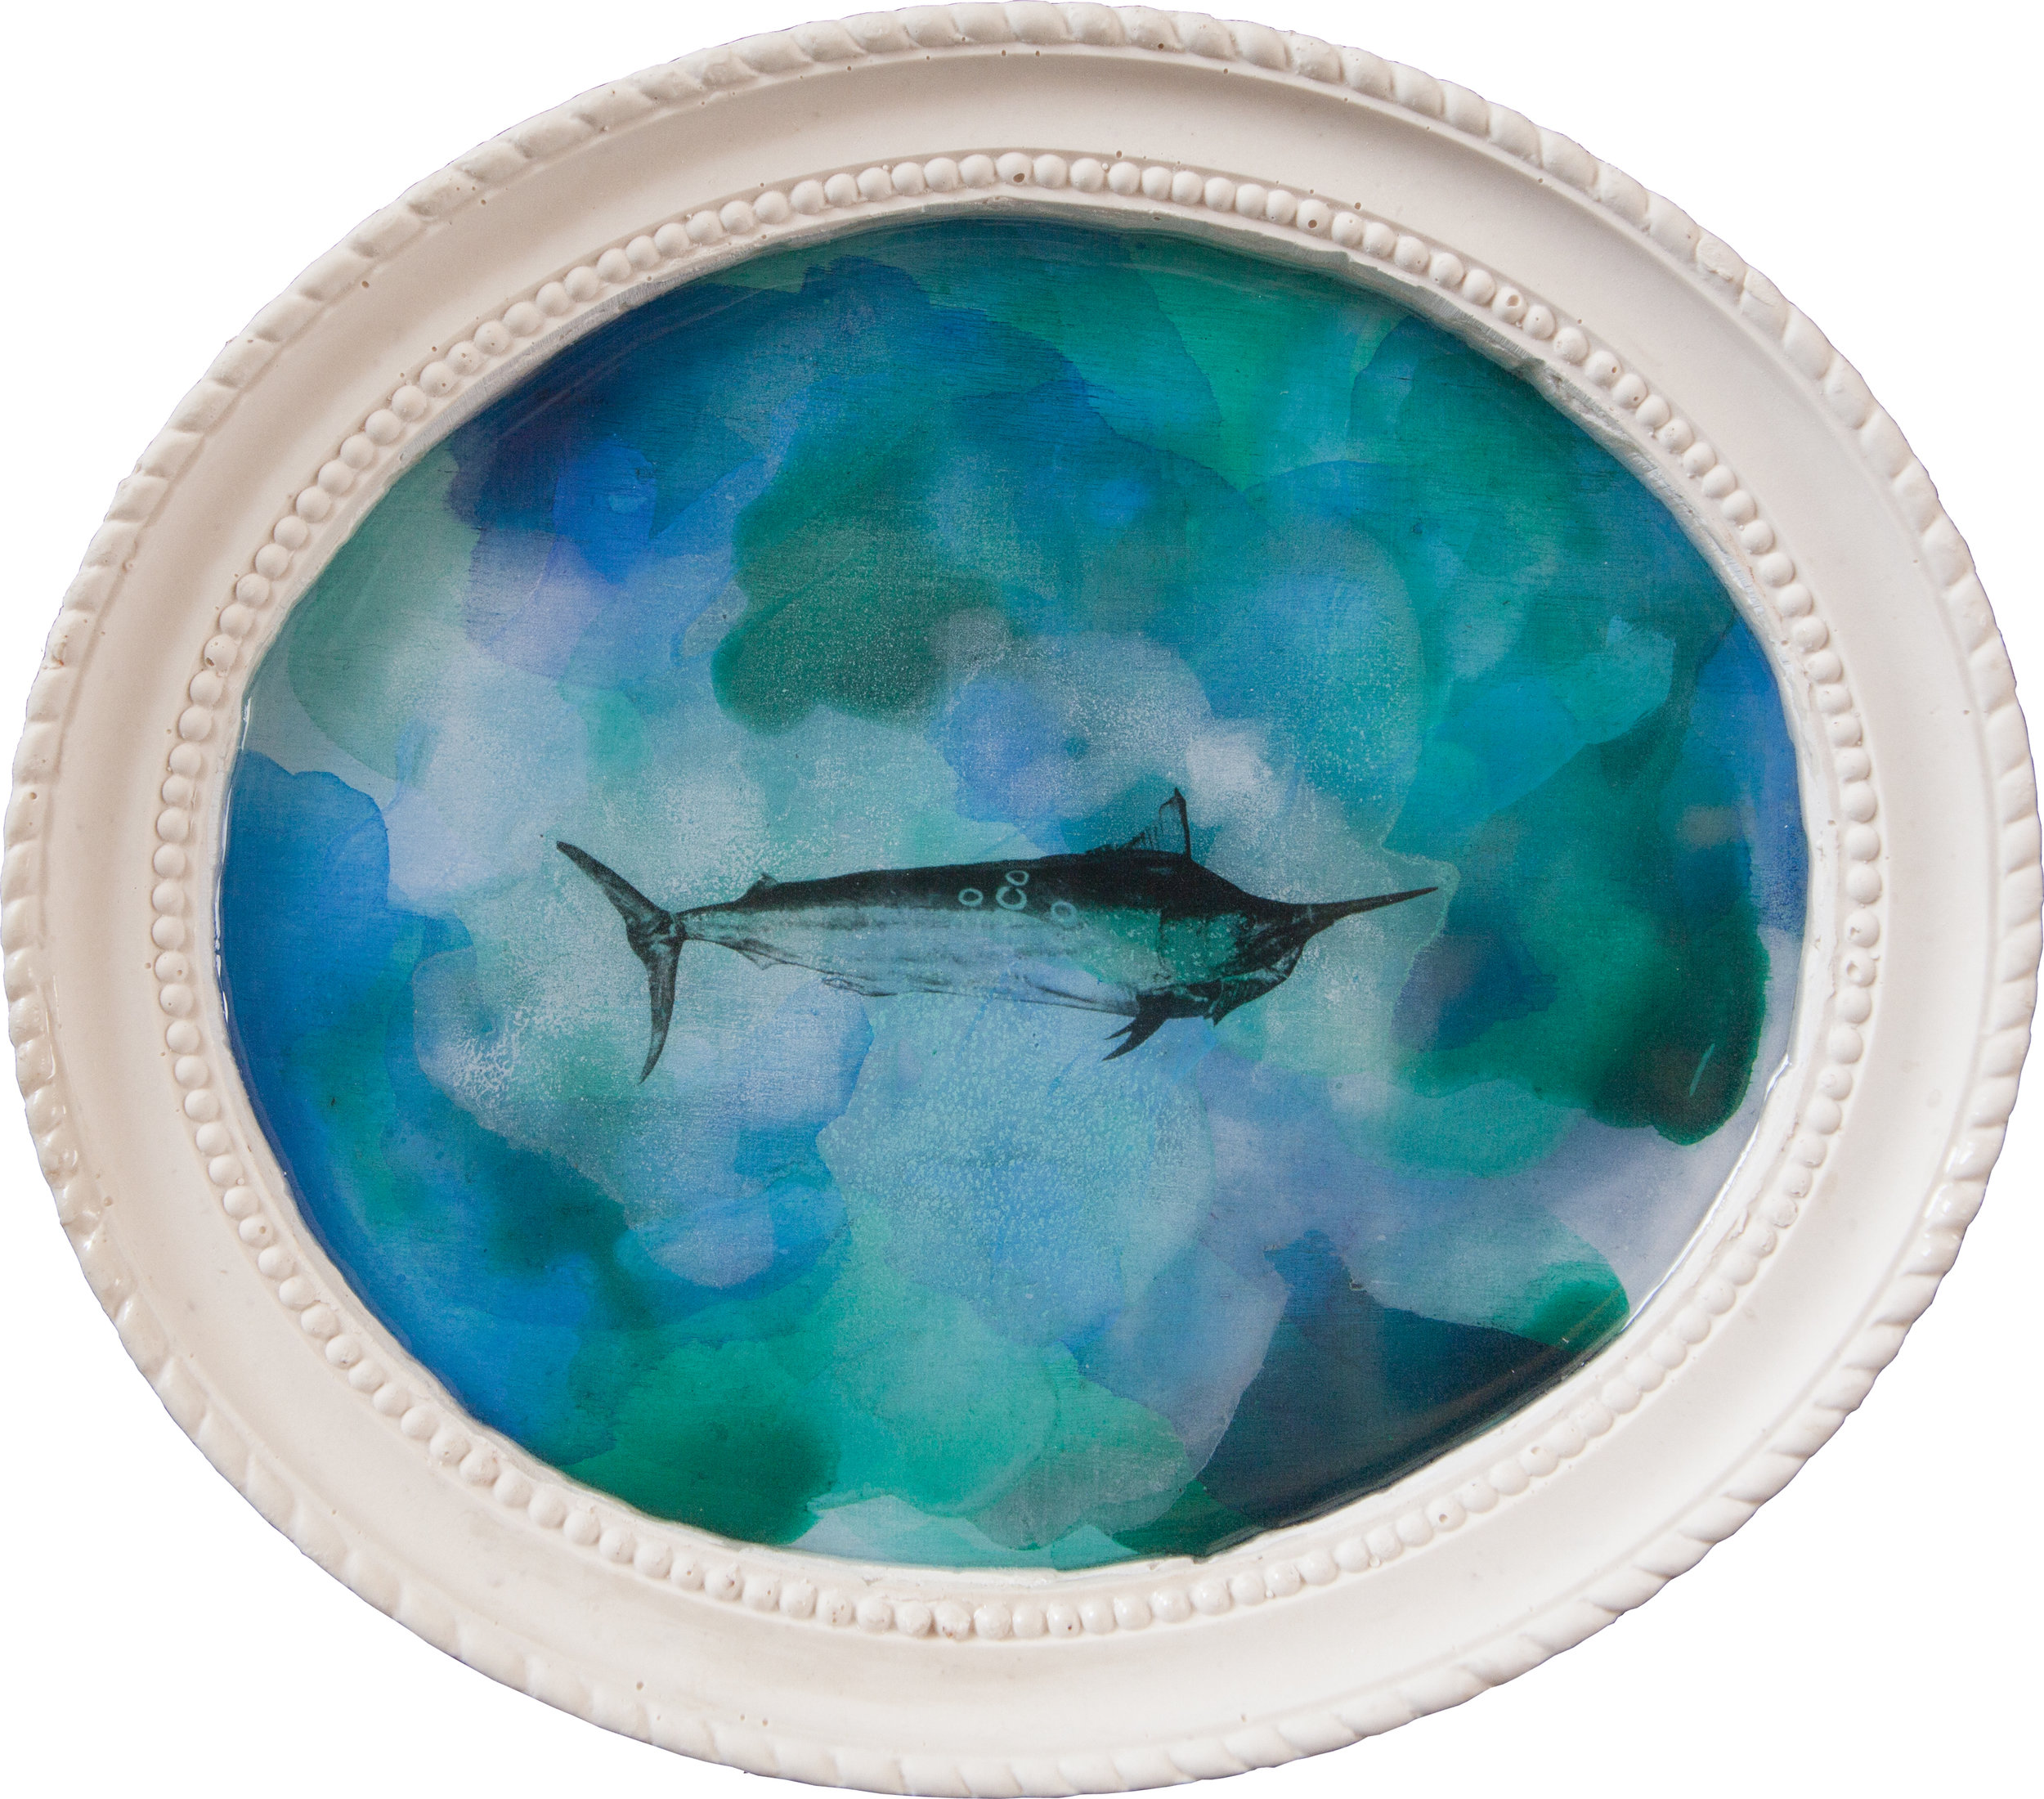 Shiraz Bayjoo    Port Hole No.2 Marlin    Acrylic on wood, resin, jesmonite  27 x 23 x 3 cm  2017